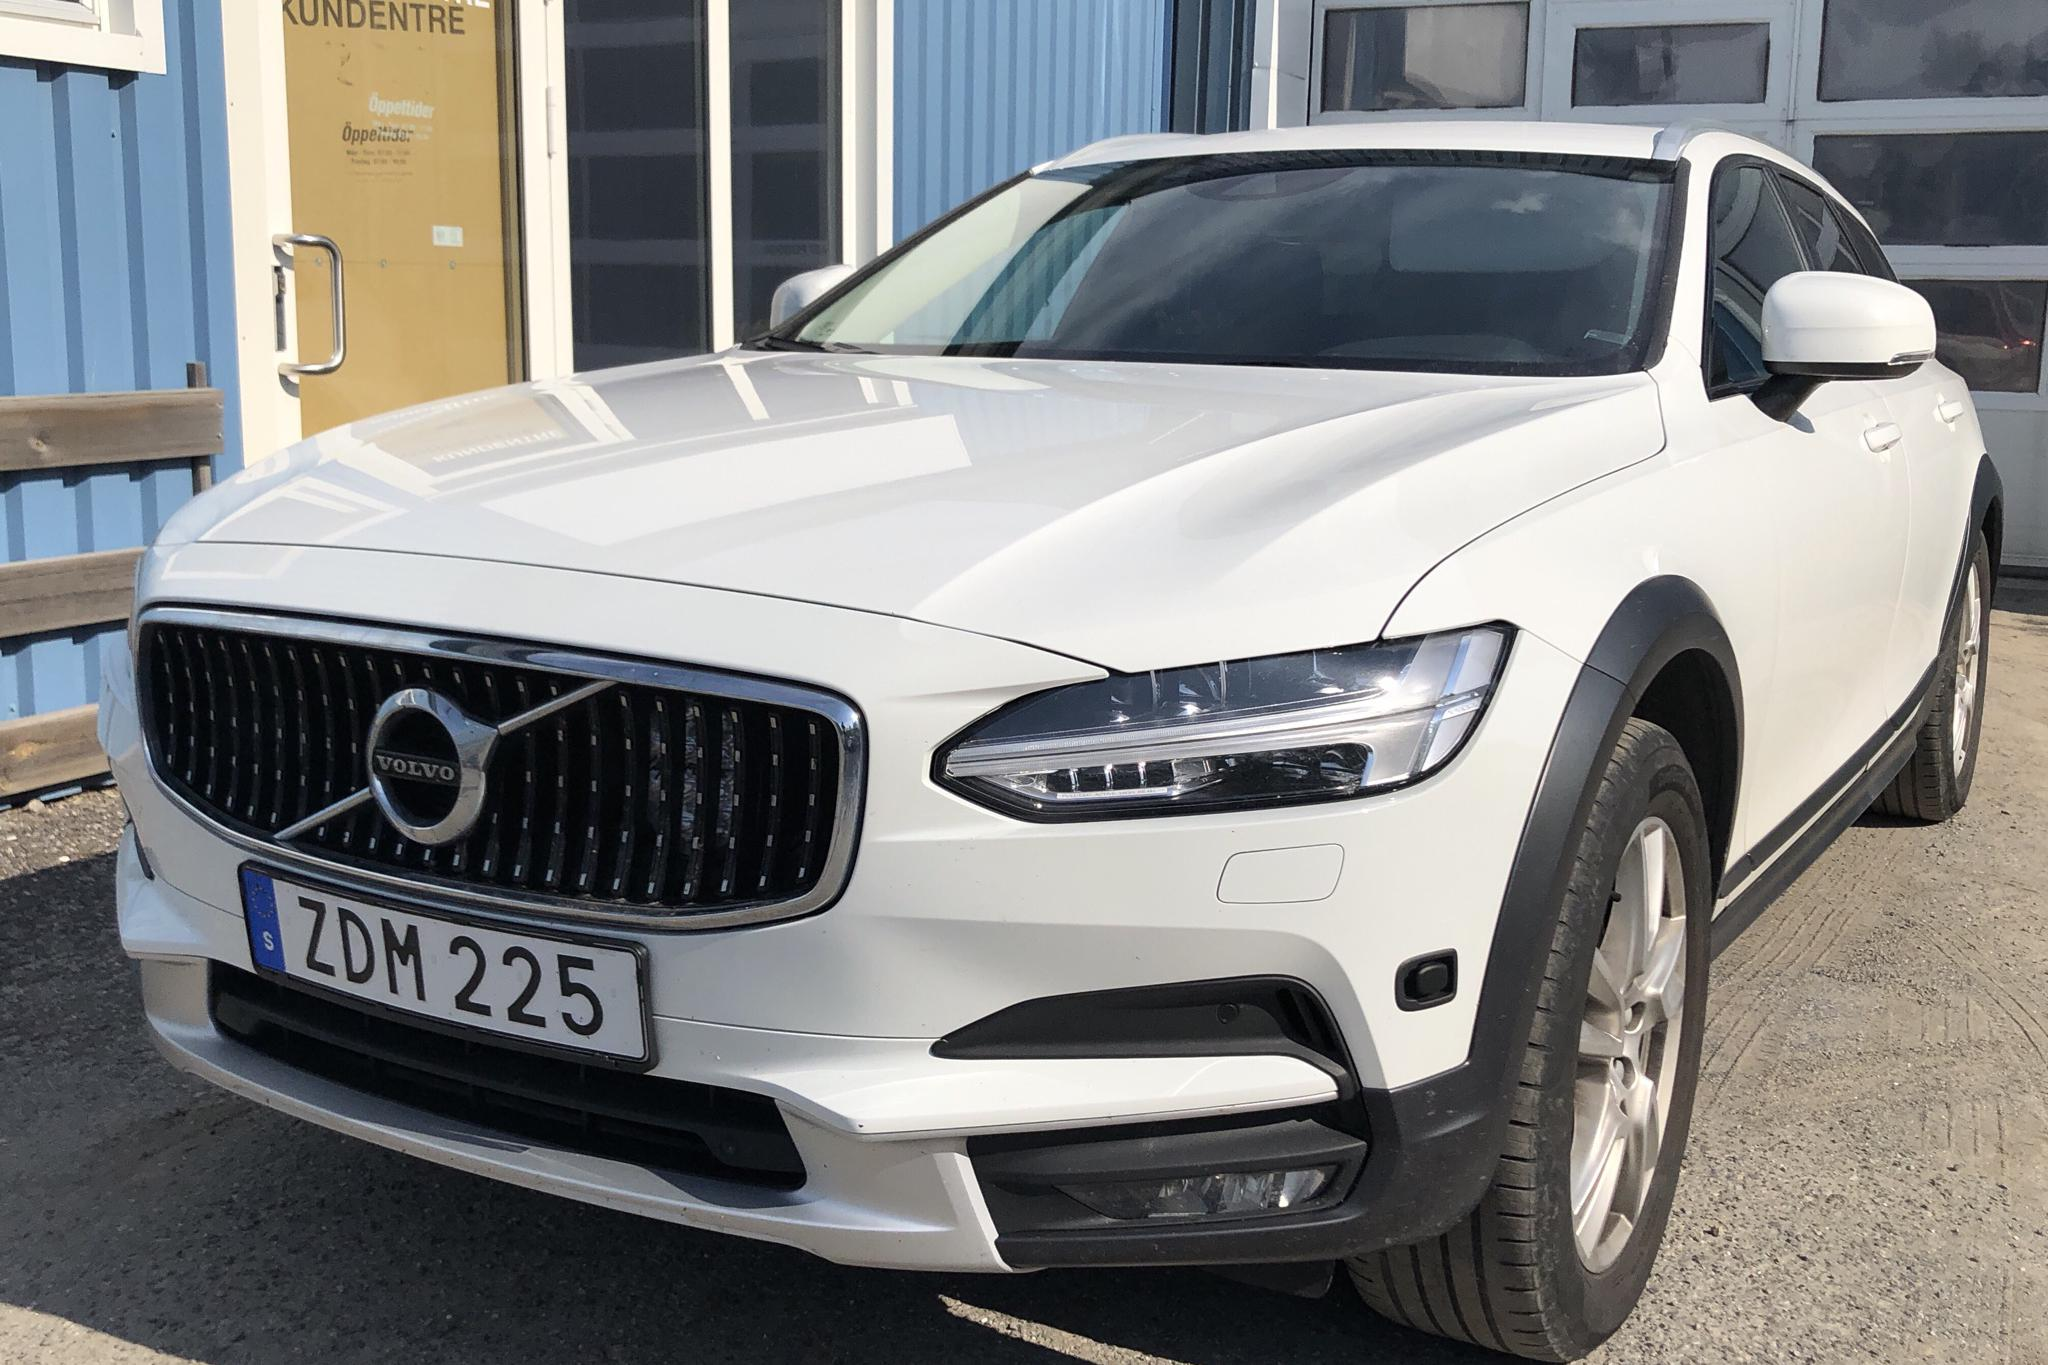 Volvo V90 D4 Cross Country AWD (190hk) - 9 924 mil - Automat - vit - 2018